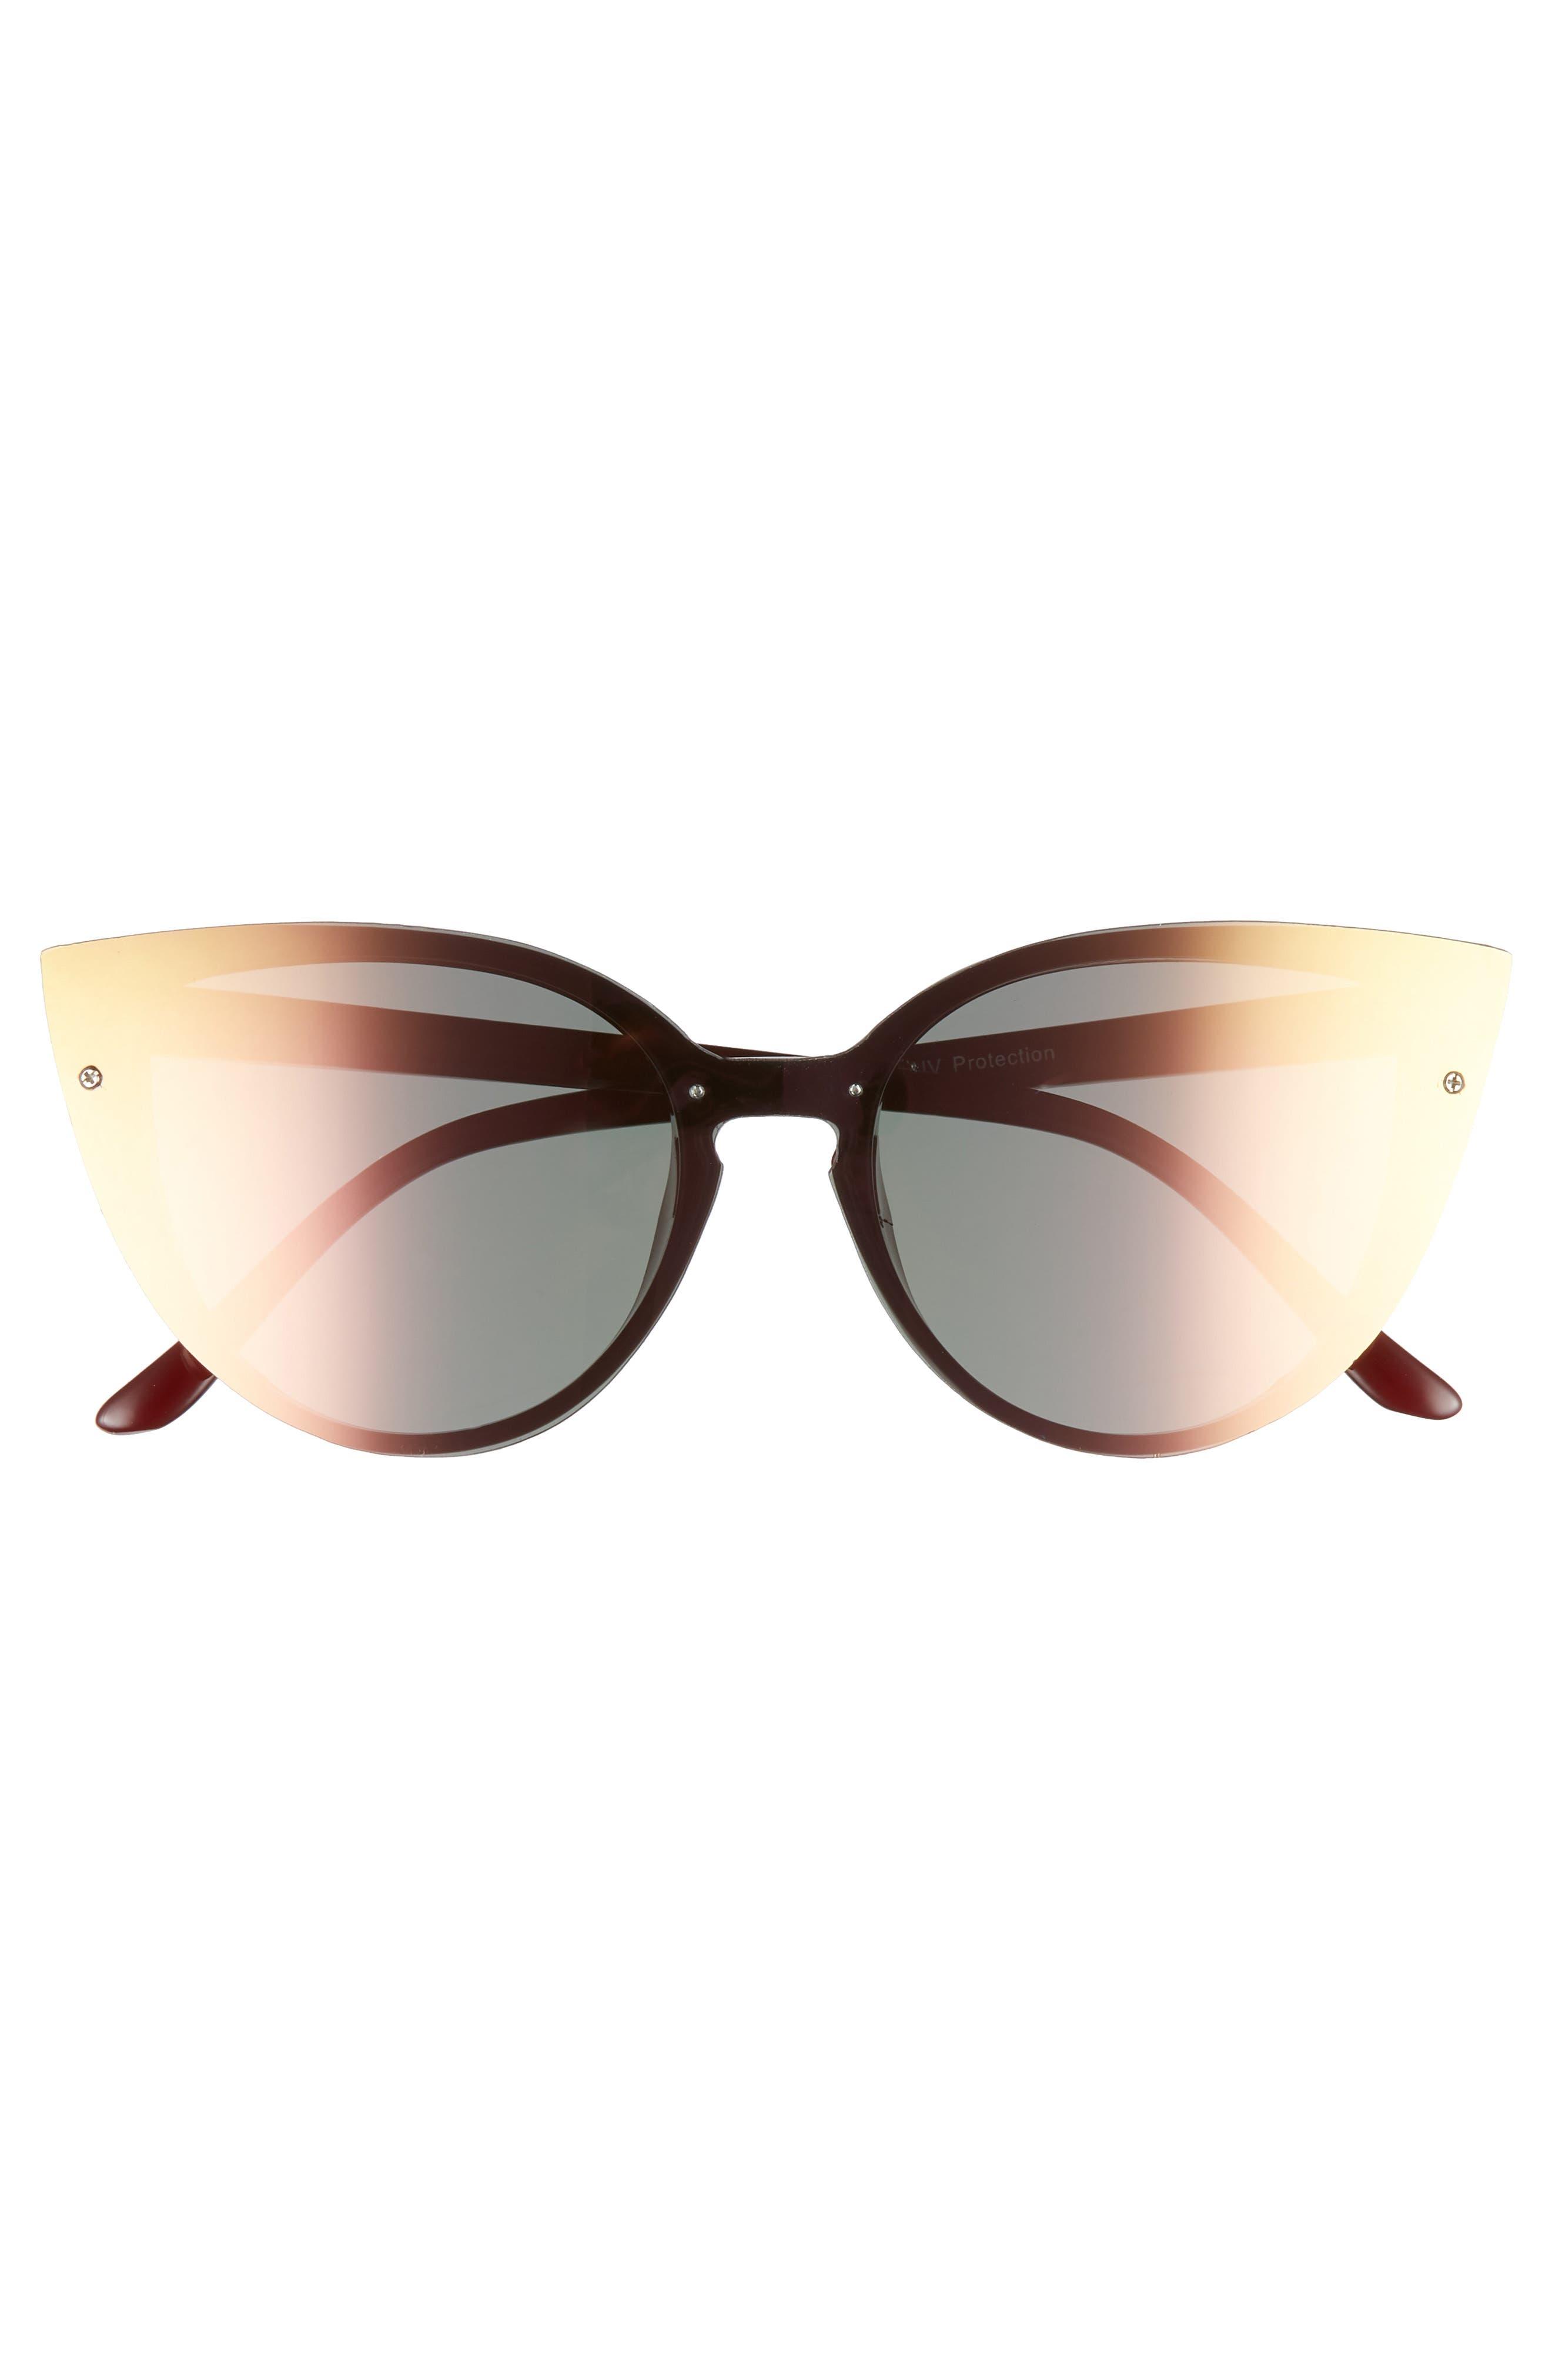 52mm Flat Cat Eye Sunglasses,                             Alternate thumbnail 3, color,                             Burgundy/ Green